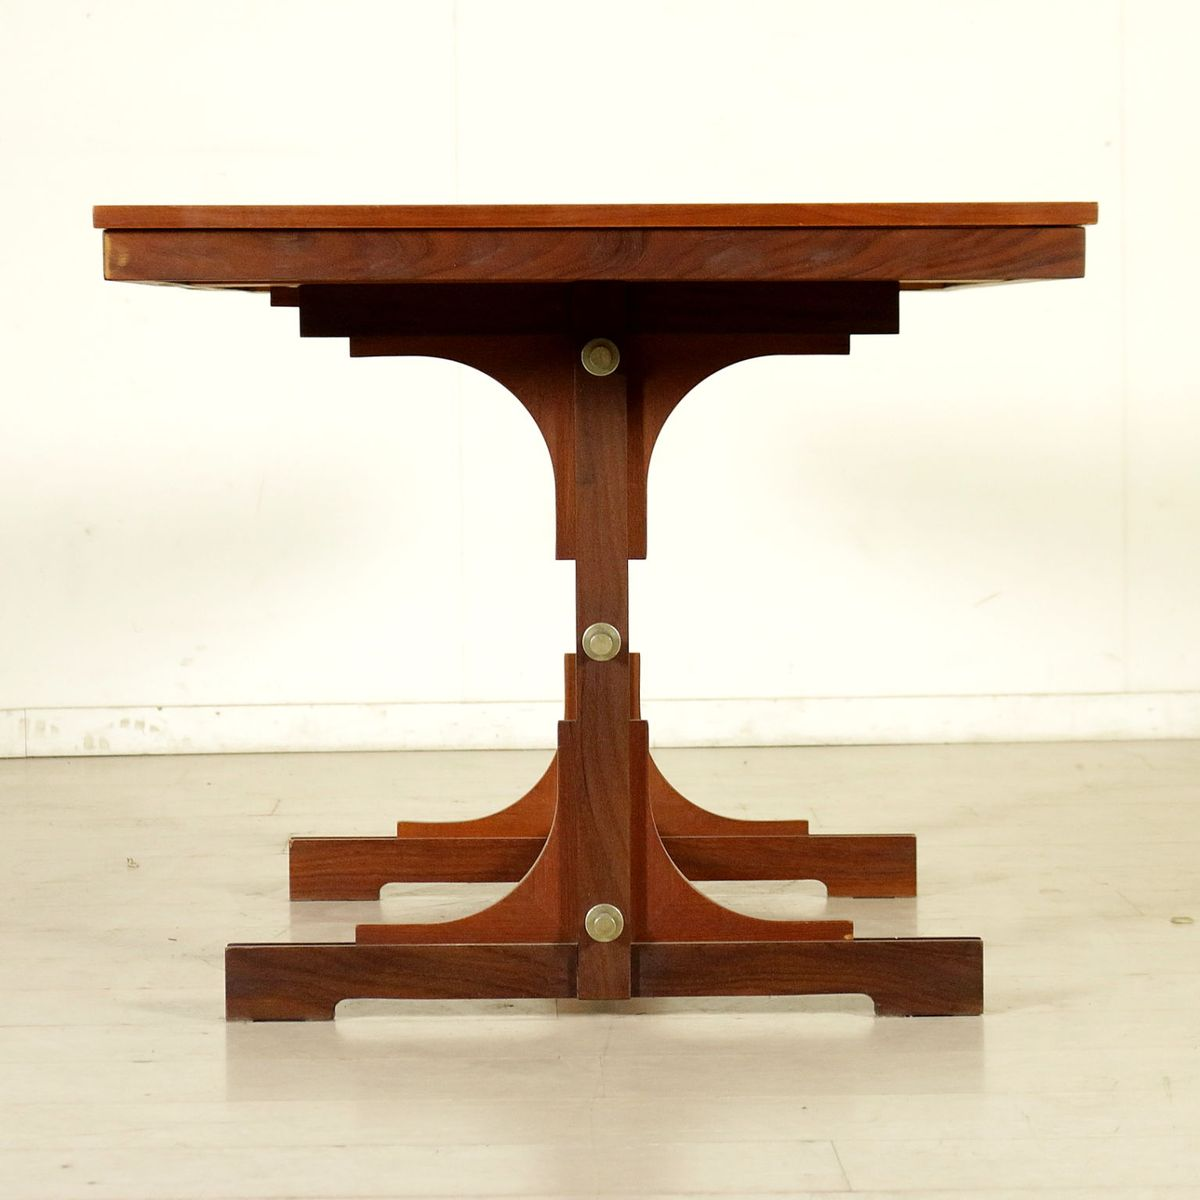 Italian Teak Veneer amp Solid Wood Extendable Dining Table  : italian teak veneer solid wood extendable dining table 1960s 15 from www.pamono.co.uk size 1200 x 1200 jpeg 66kB